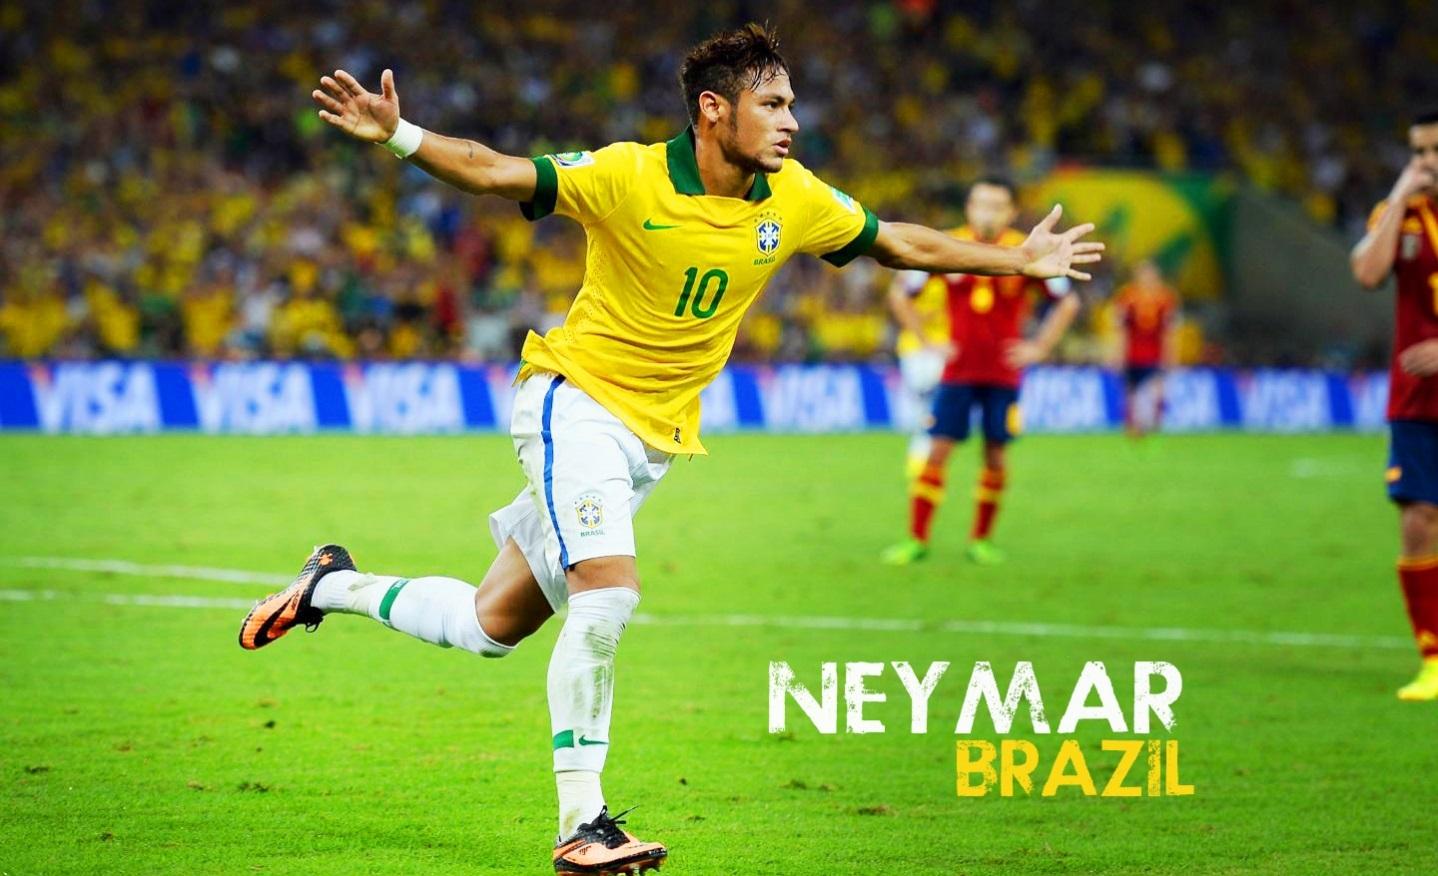 ... wallpaper neymar and oscar goal training neymar and oscar wallpaper